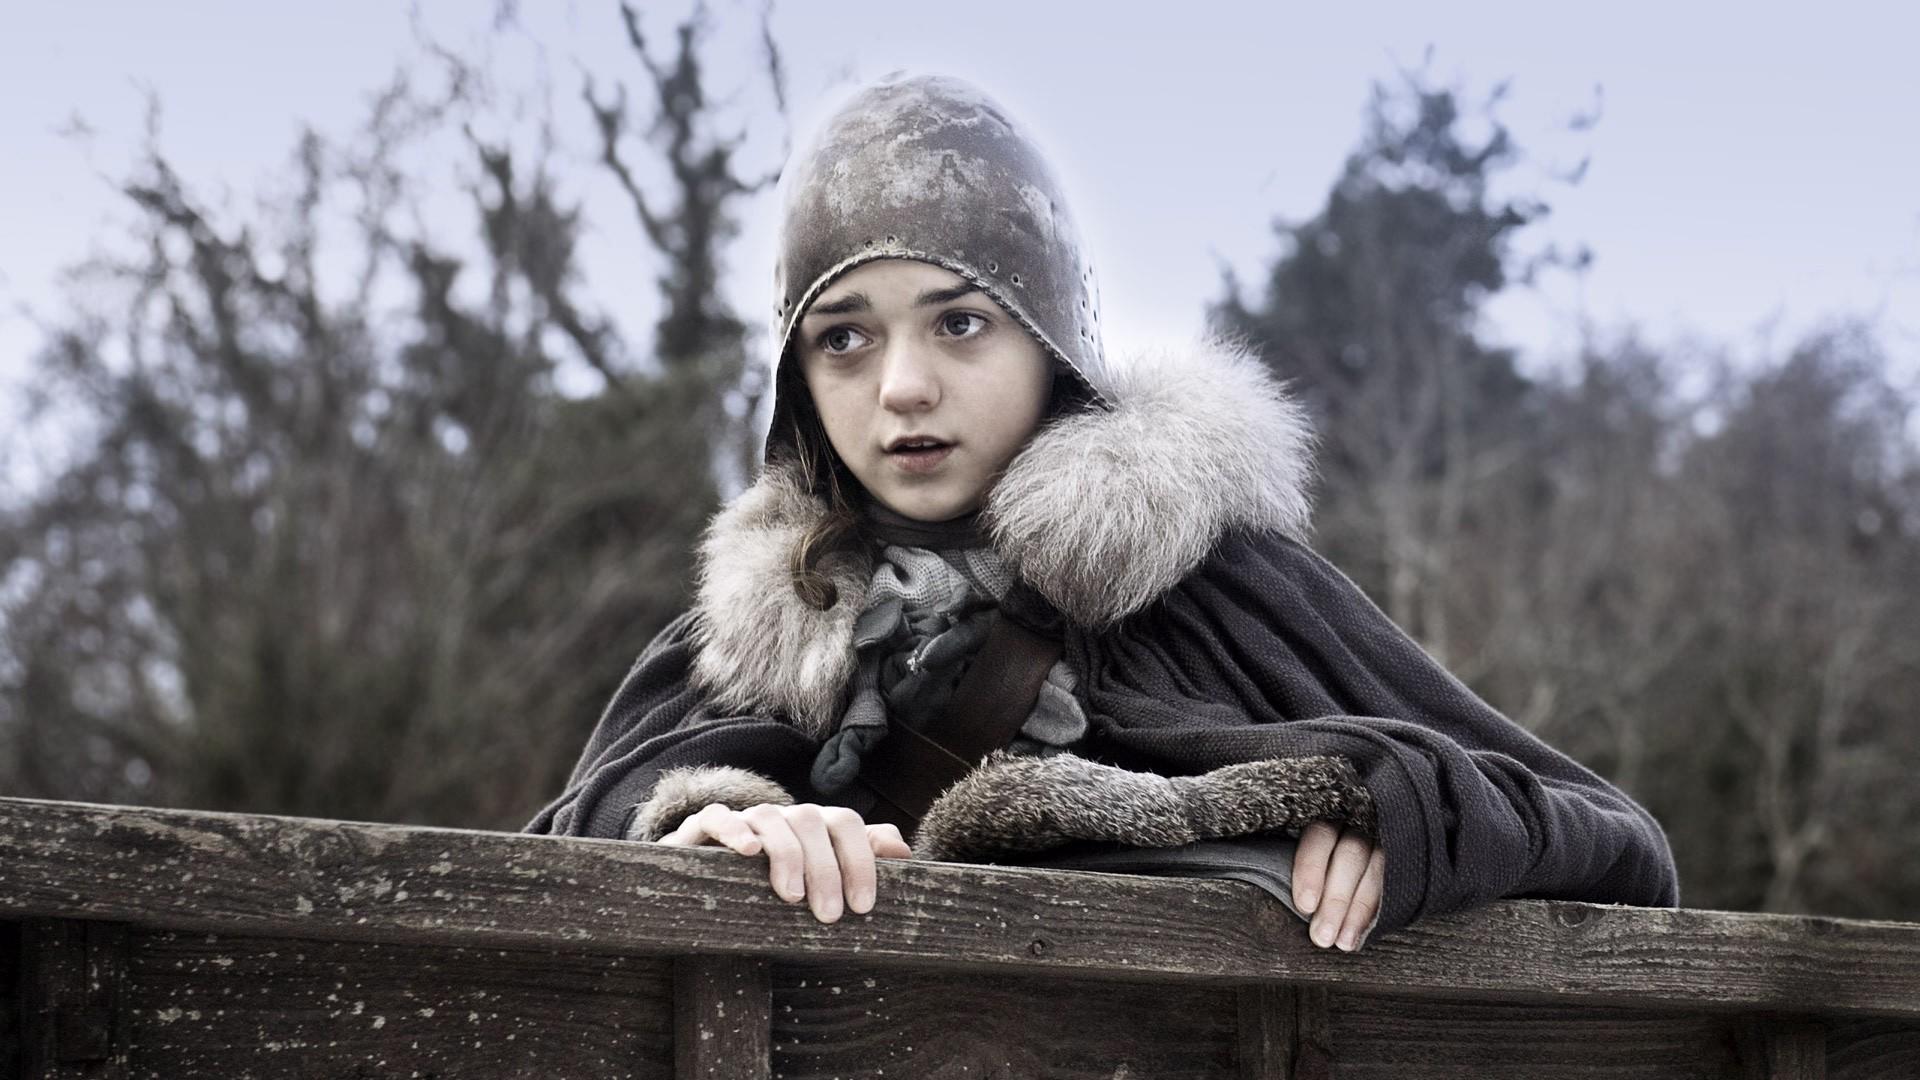 Arya Stark 101